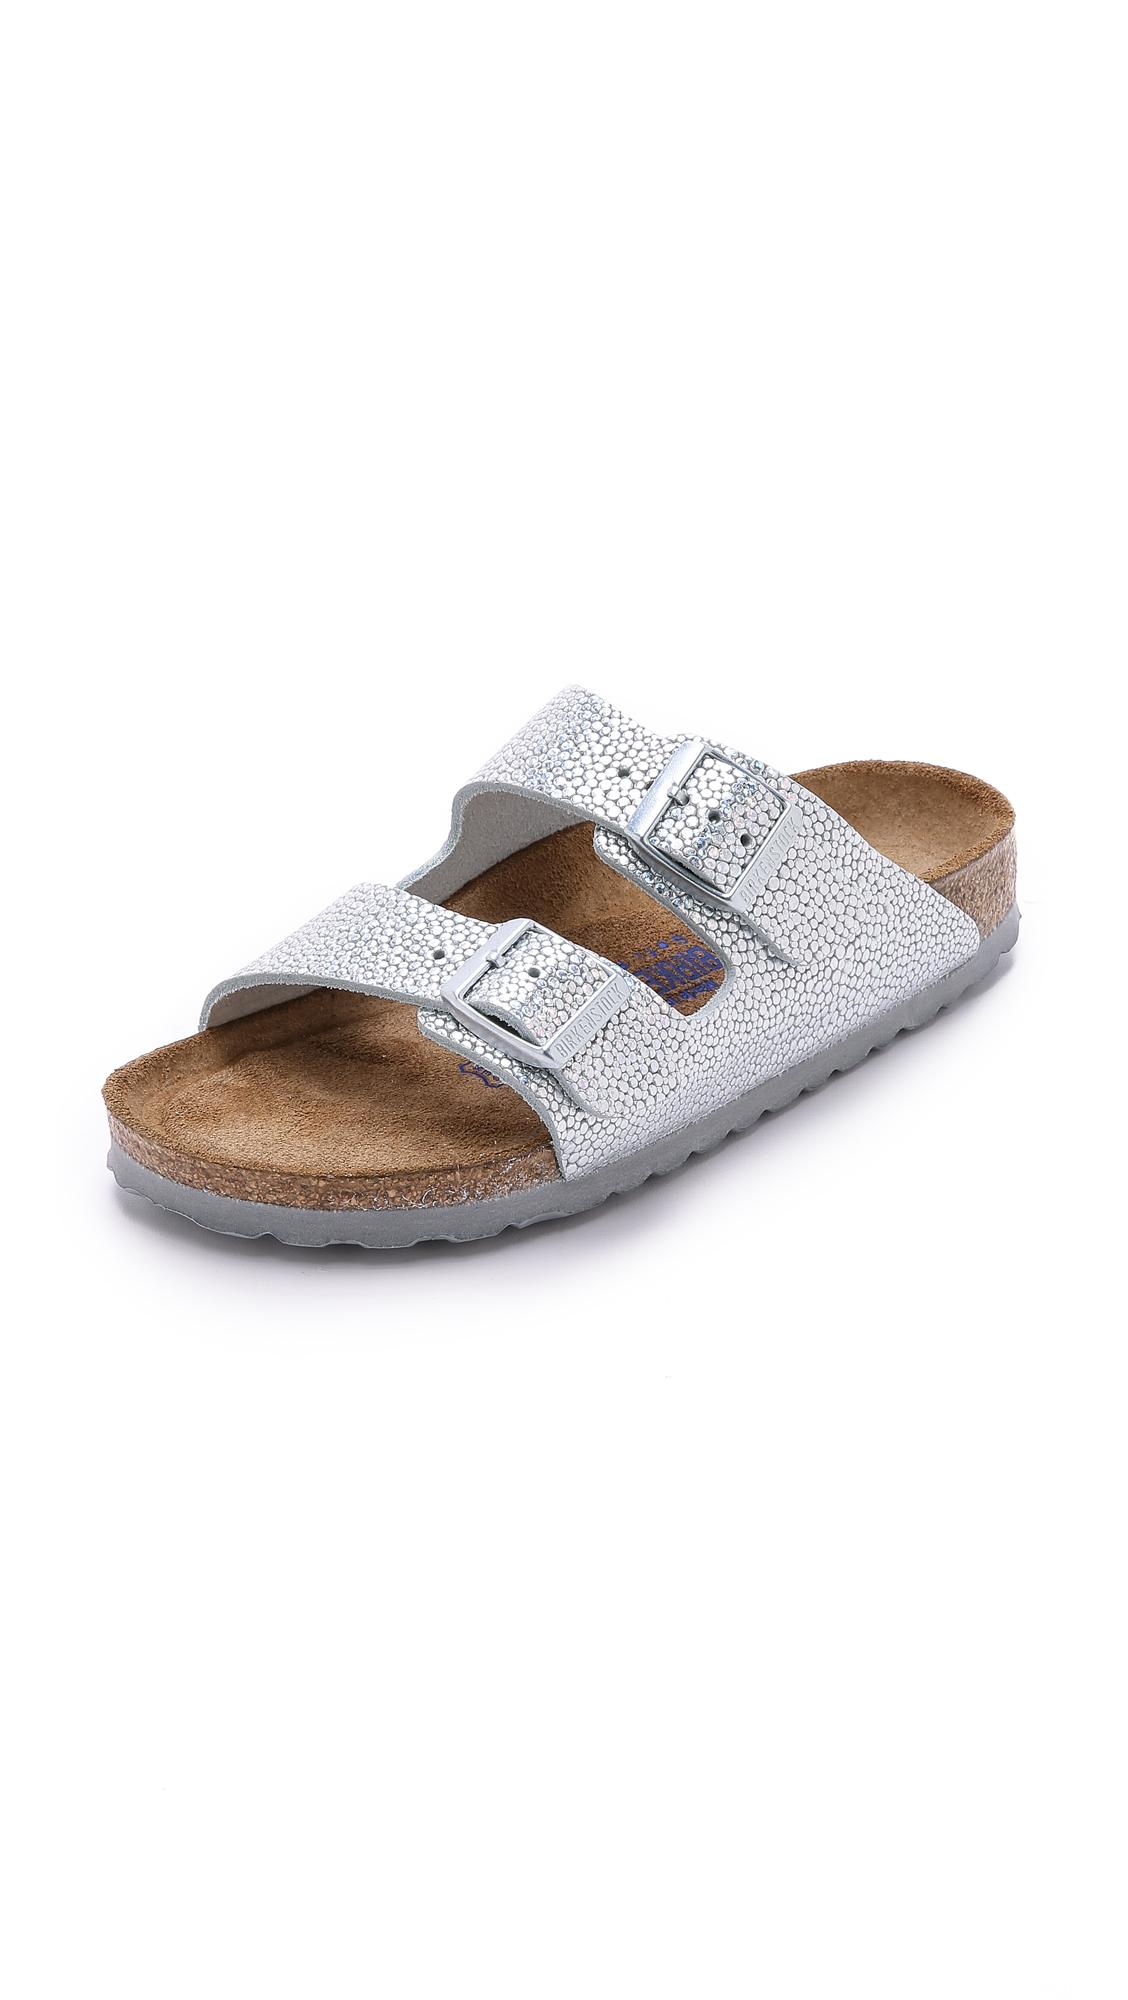 birkenstock arizona two band sfb sandals pebbles. Black Bedroom Furniture Sets. Home Design Ideas